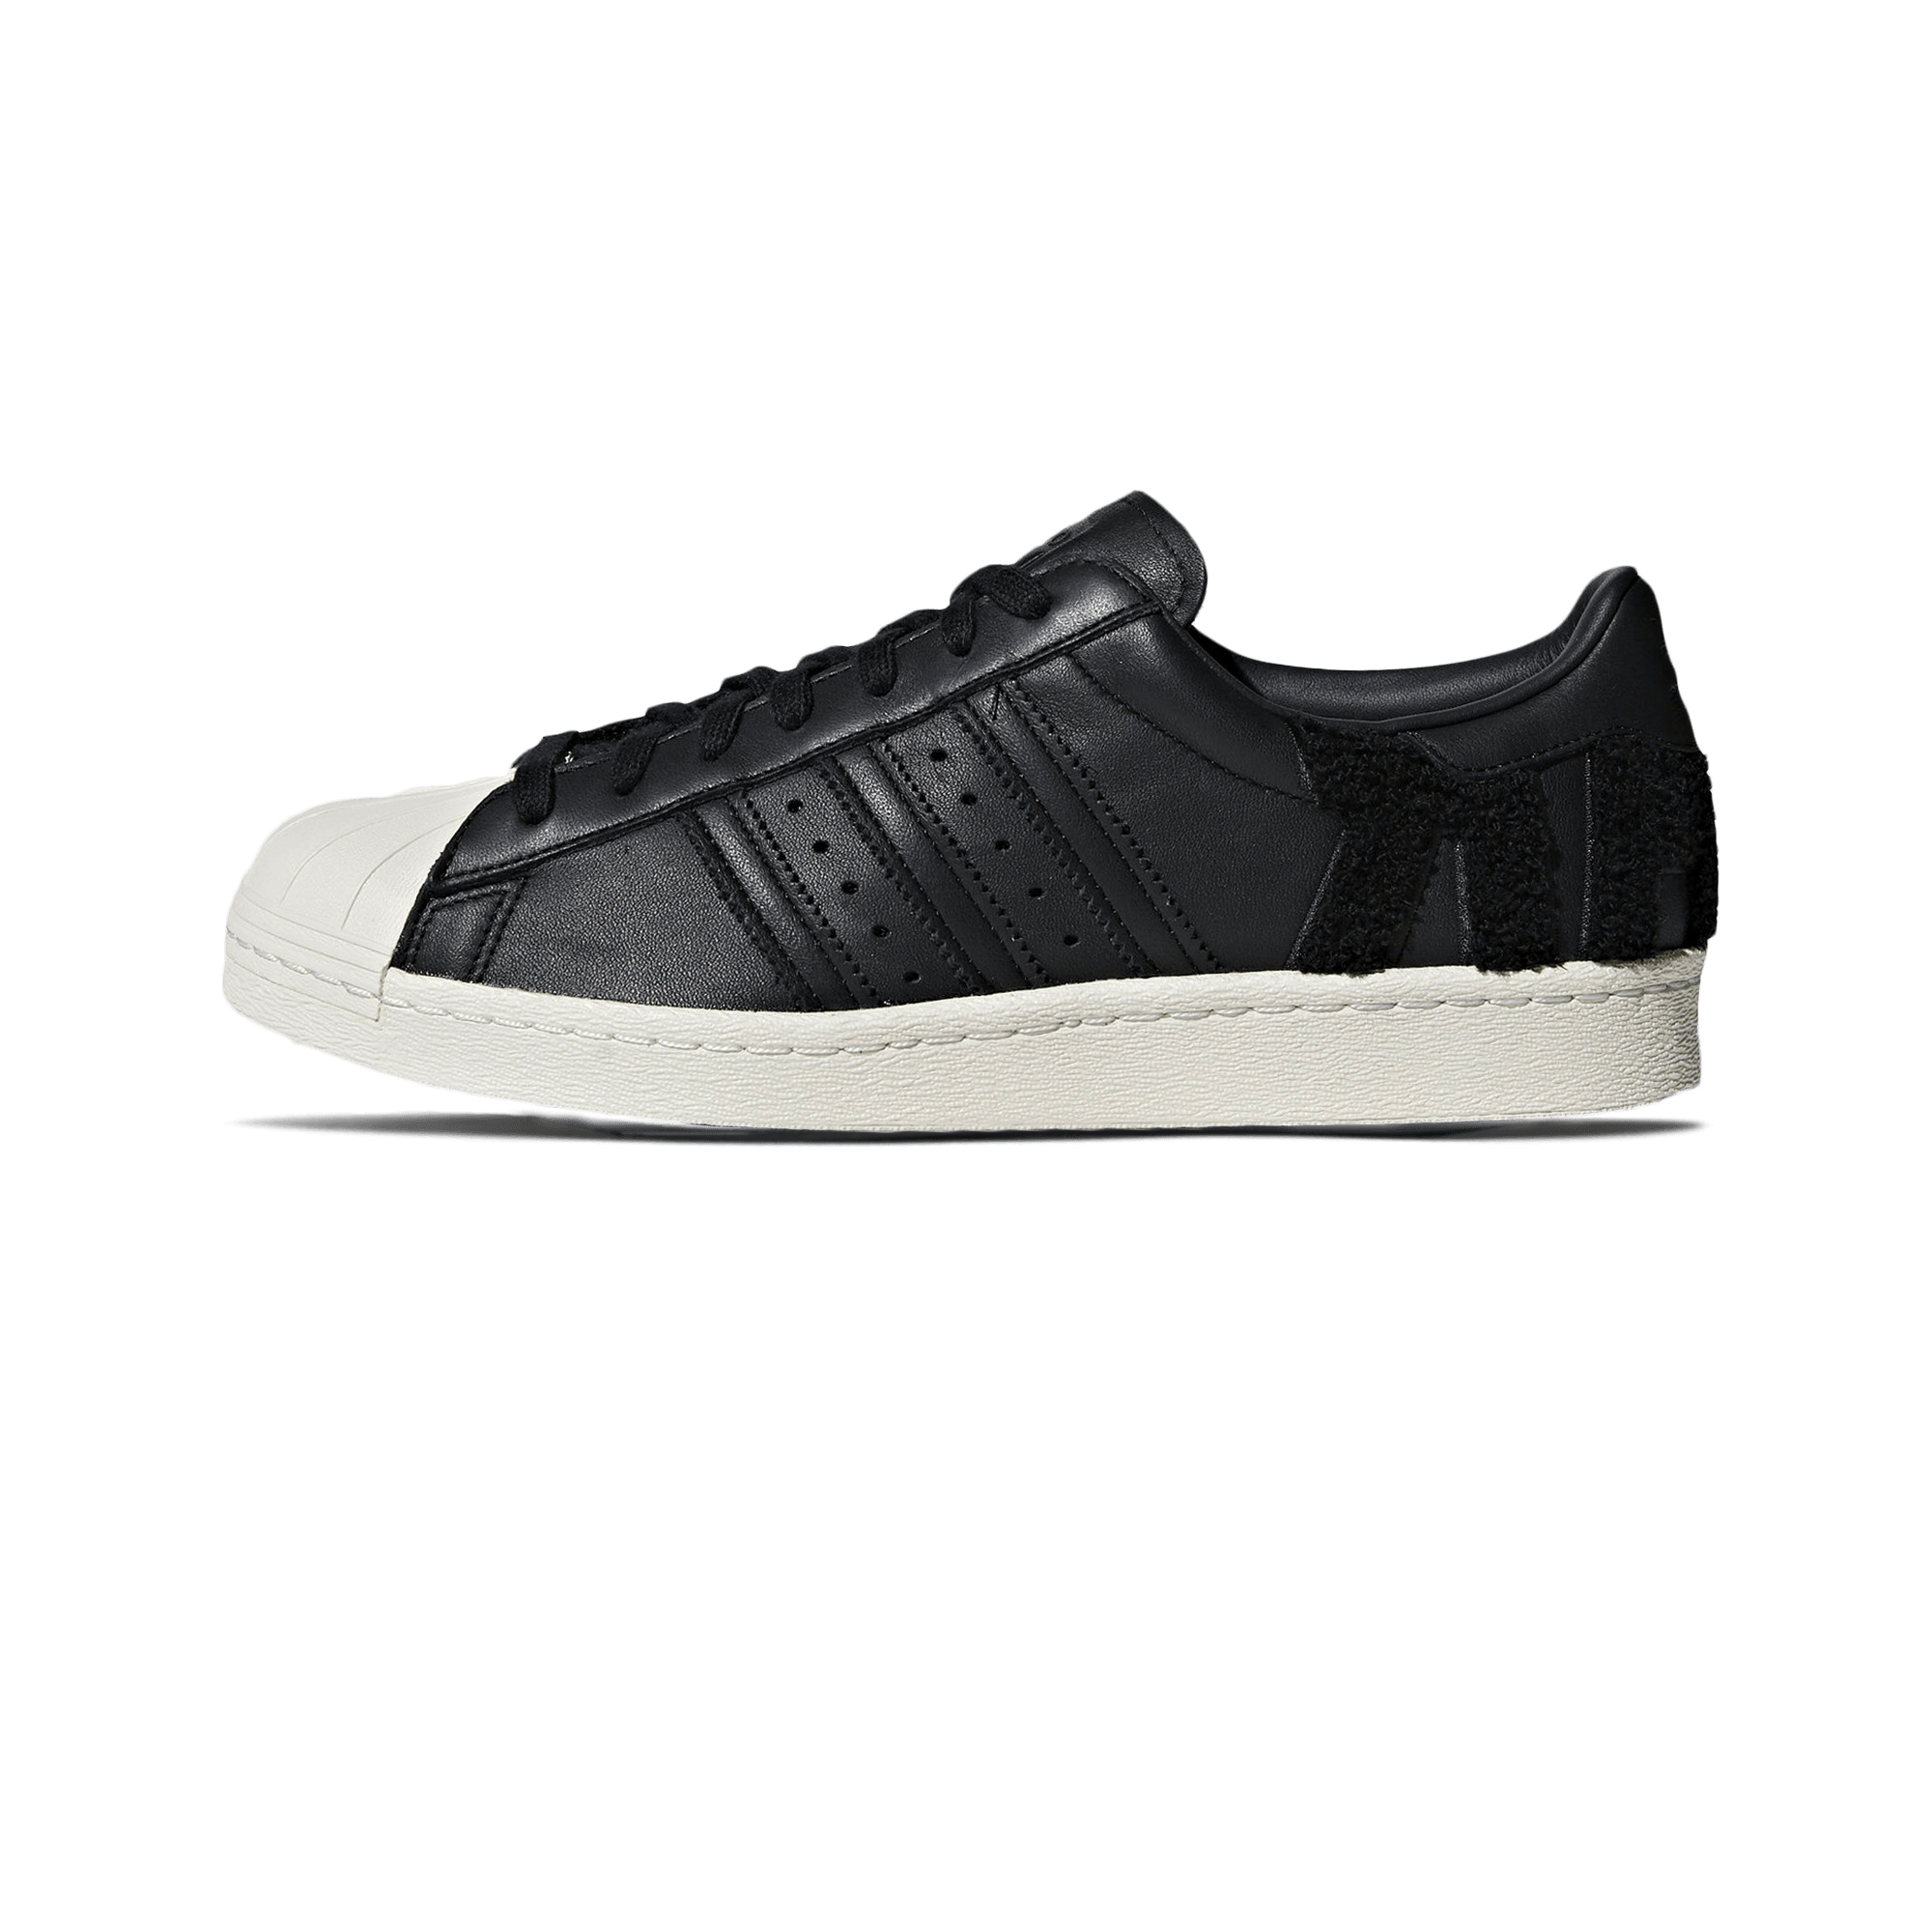 adidas Superstar 80s Core Black Core Black Core Black